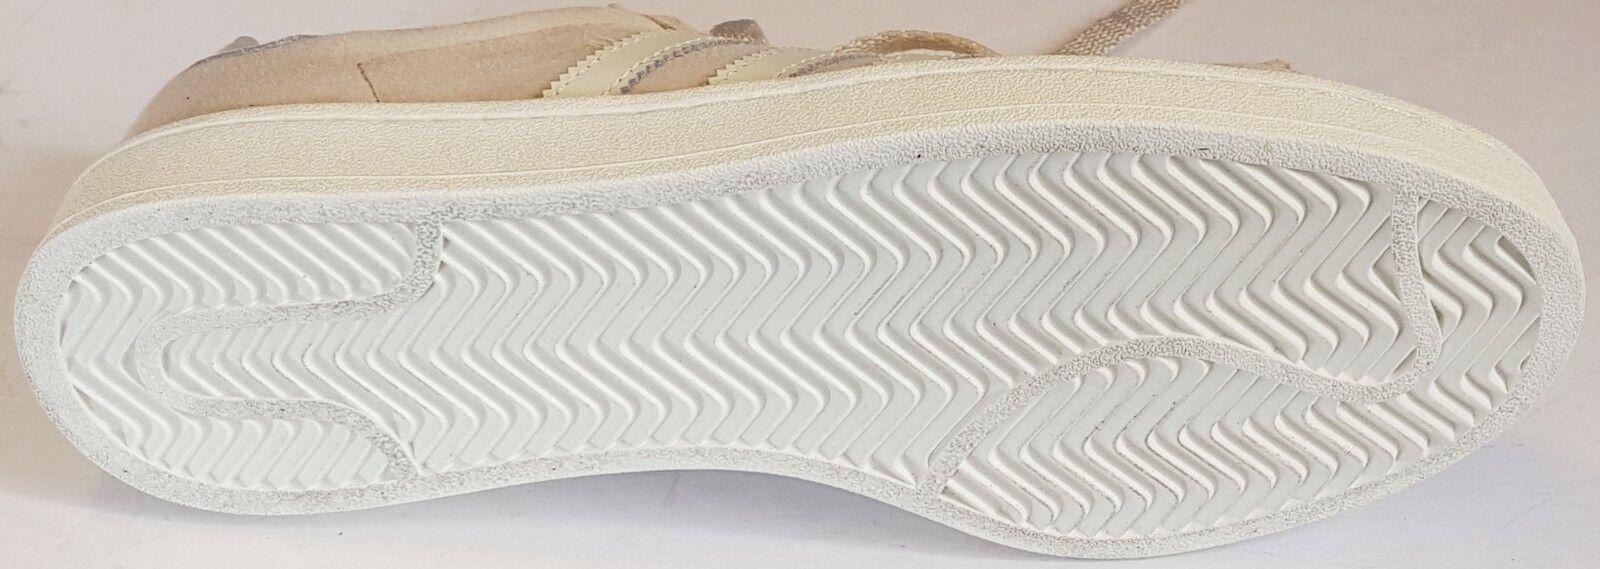 ADIDAS mens CLEAR braun Weiß original CAMPUS BB0085 fashion fashion fashion Turnschuhe Größe 8 995c2e